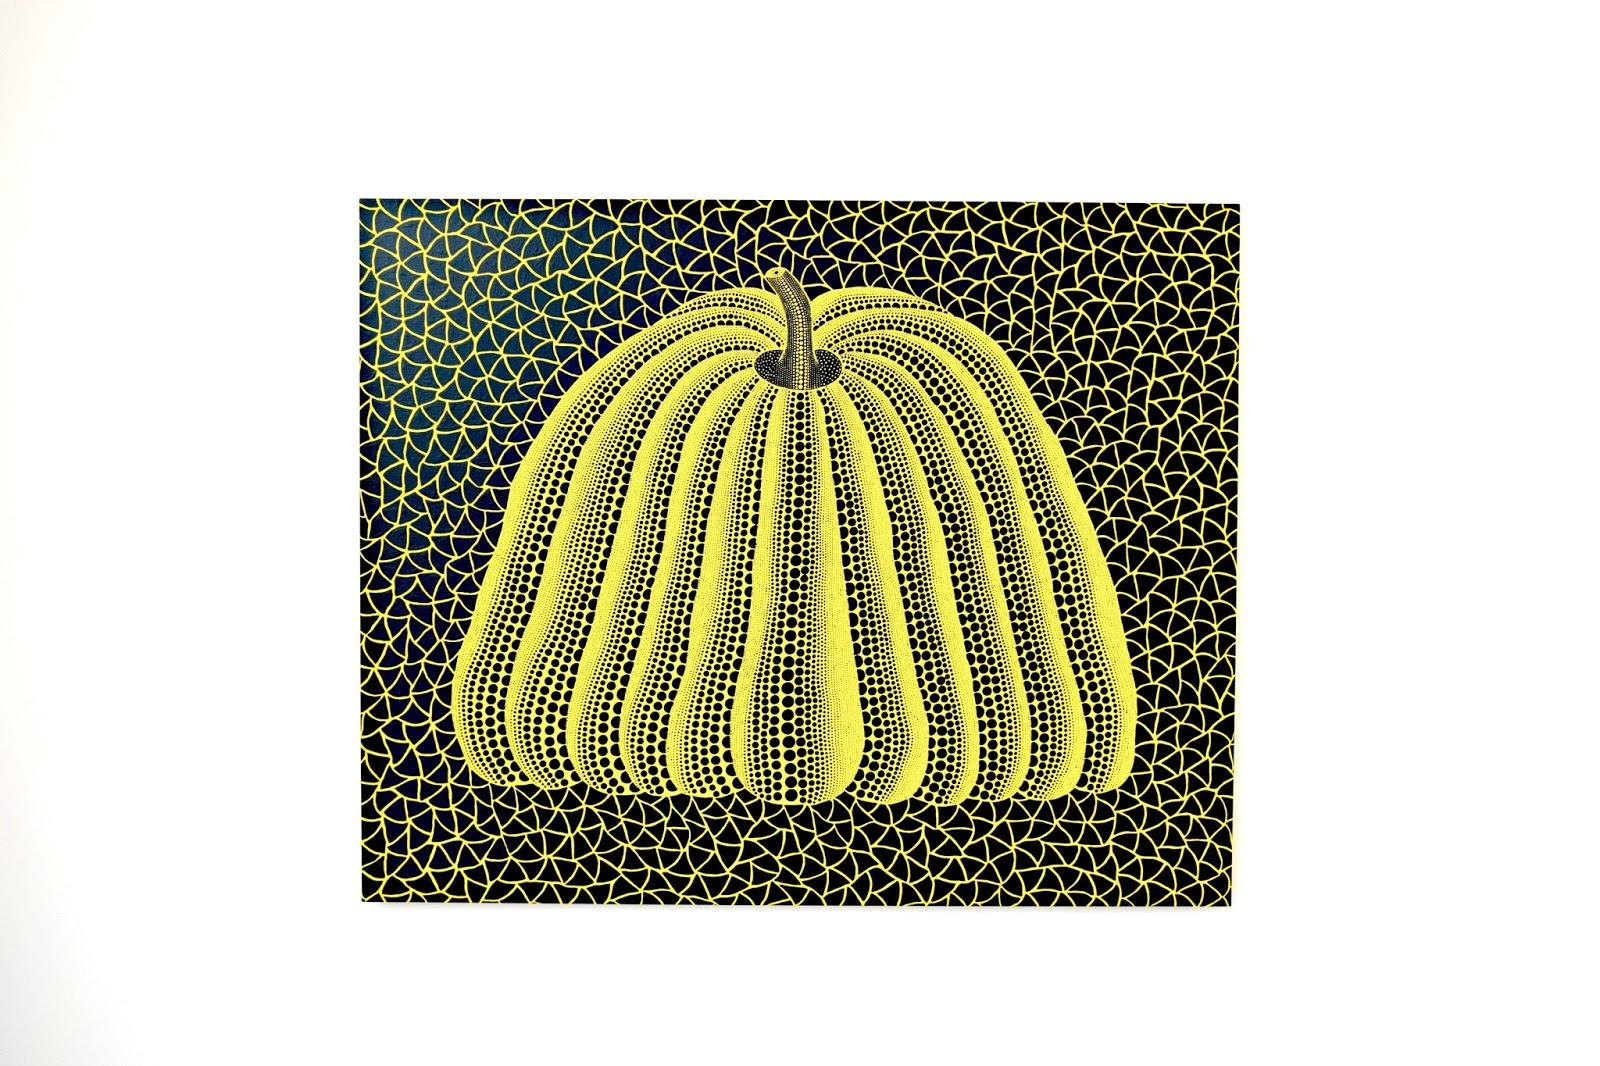 Pumpkin painting acryl on canvas by Yayoi Kusama